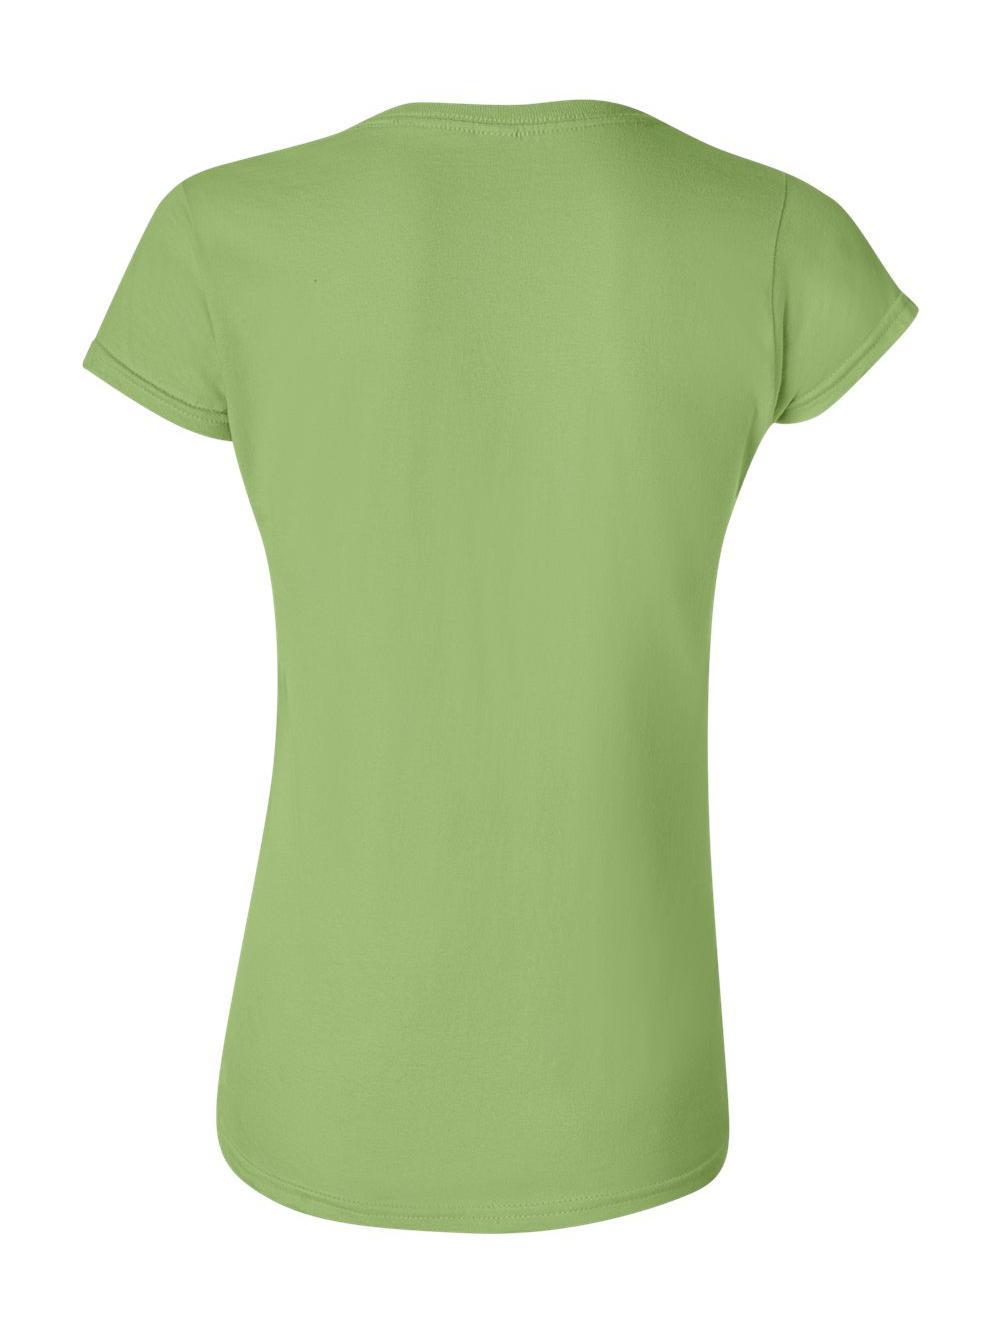 Gildan-Softstyle-Women-039-s-T-Shirt-64000L thumbnail 31